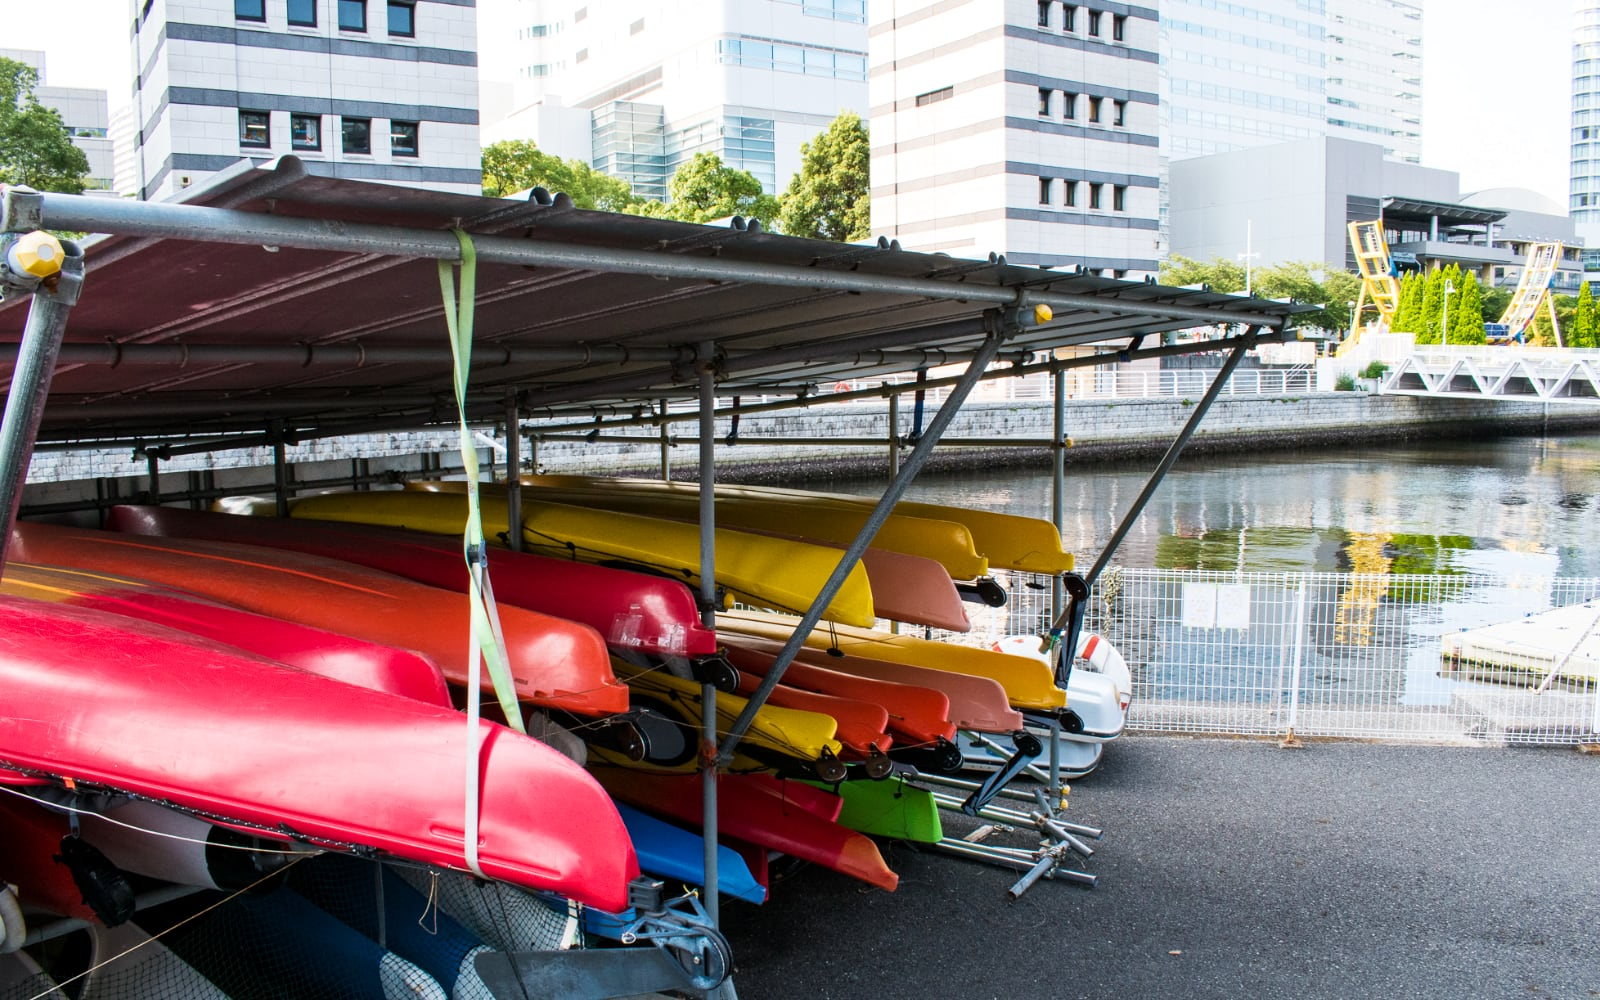 kayaking Yokohama Nippon Maru: A Must Add to your Yokohama Itinerary